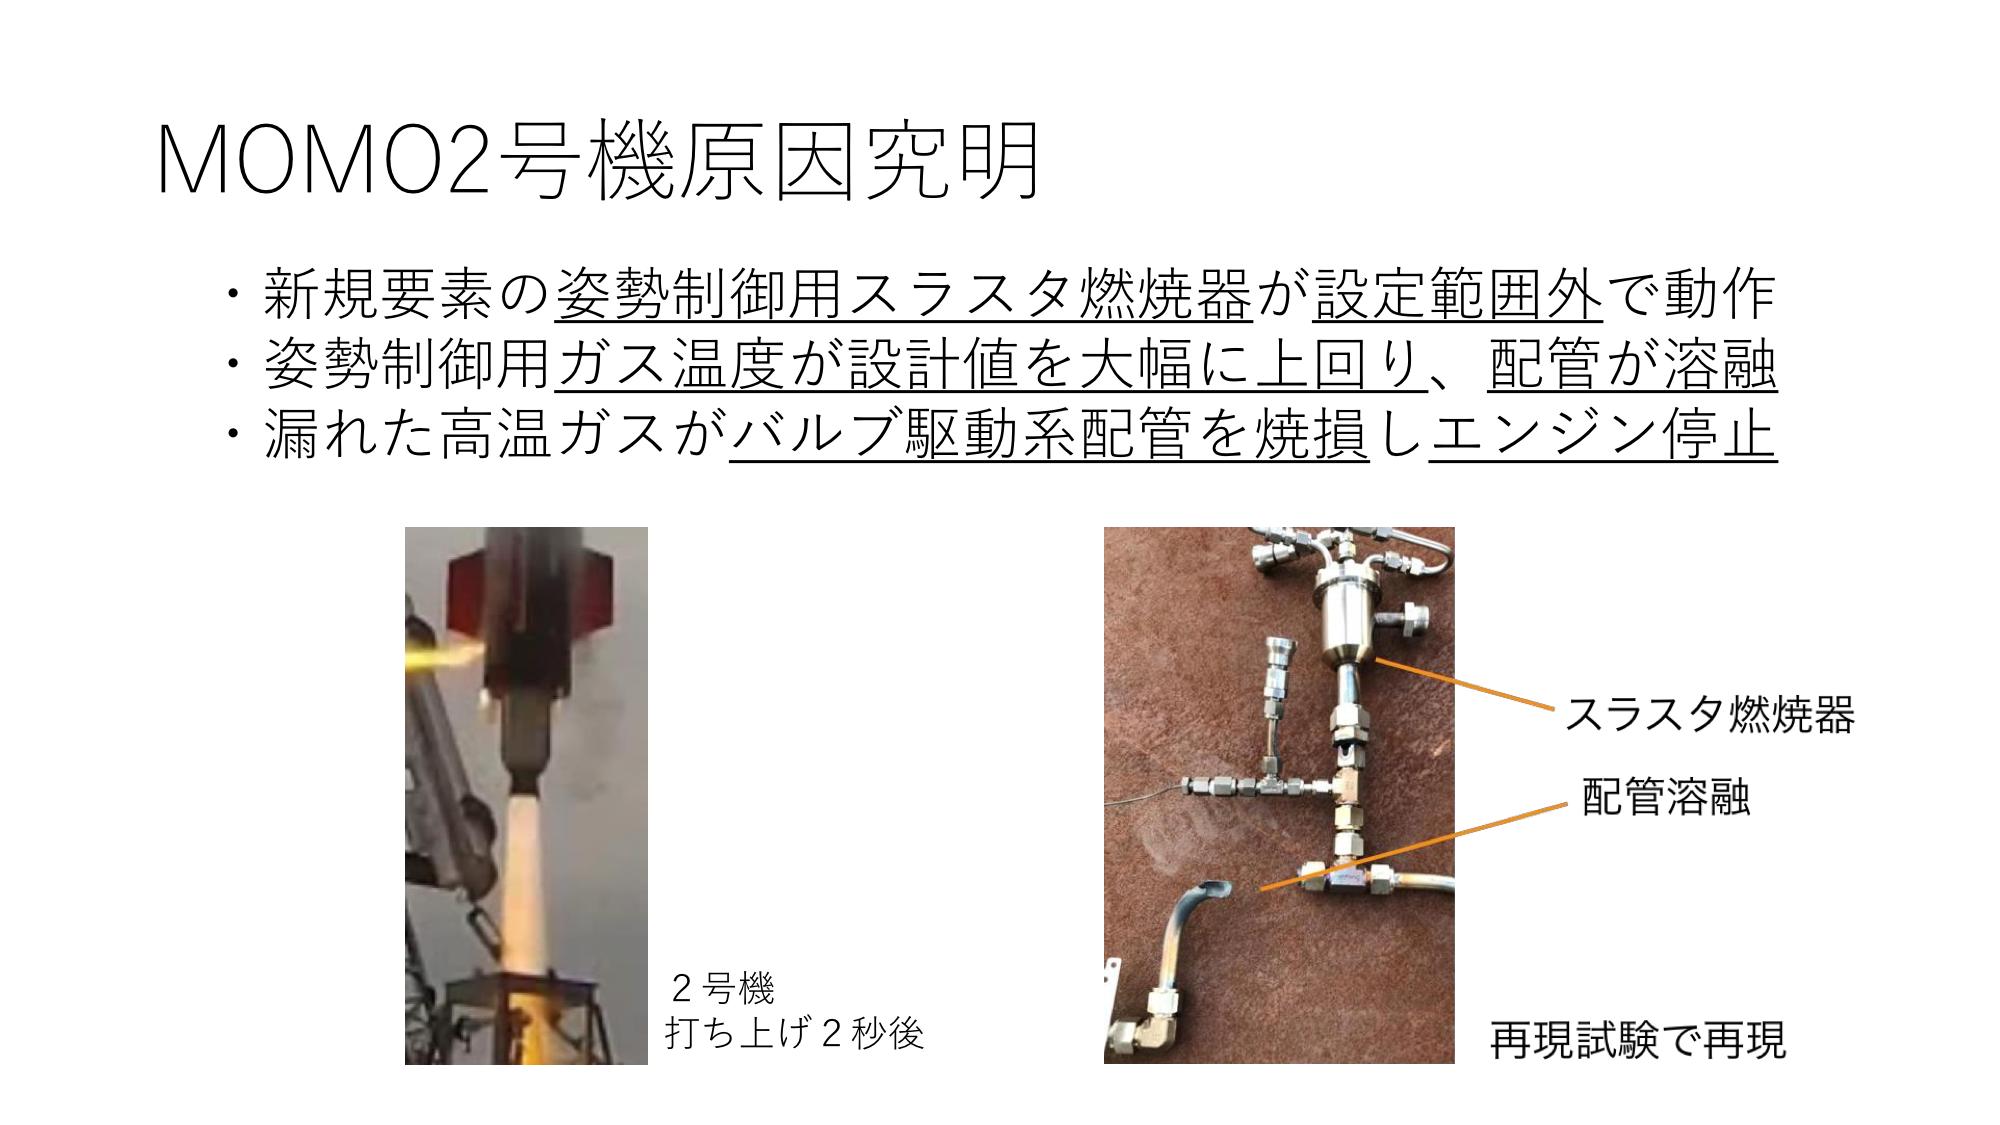 f:id:Imamura:20190414213955p:plain